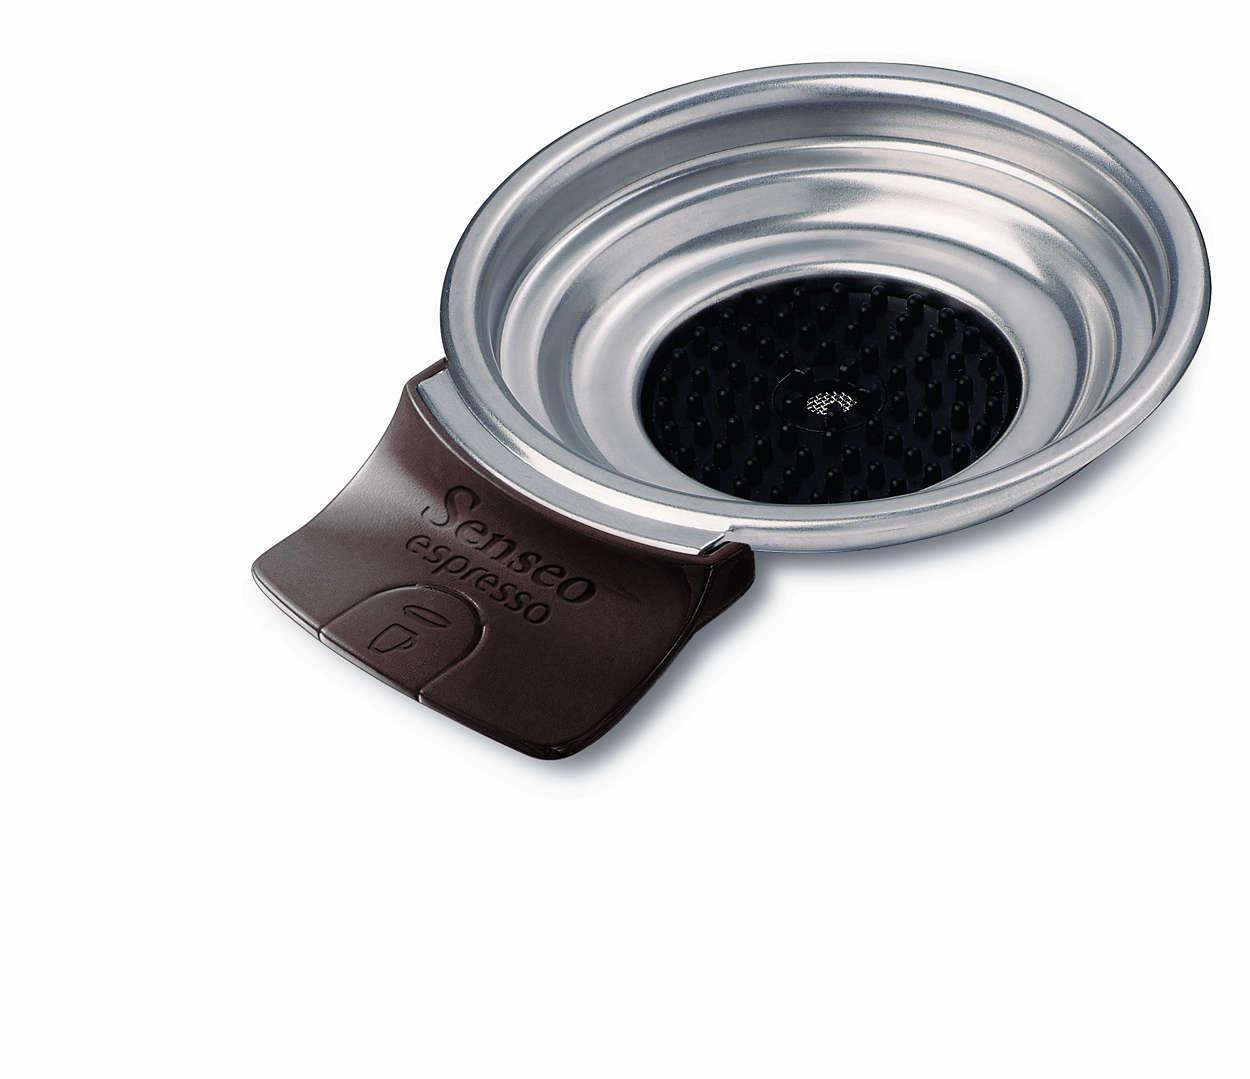 espresso padhalter hd7003 10 senseo. Black Bedroom Furniture Sets. Home Design Ideas